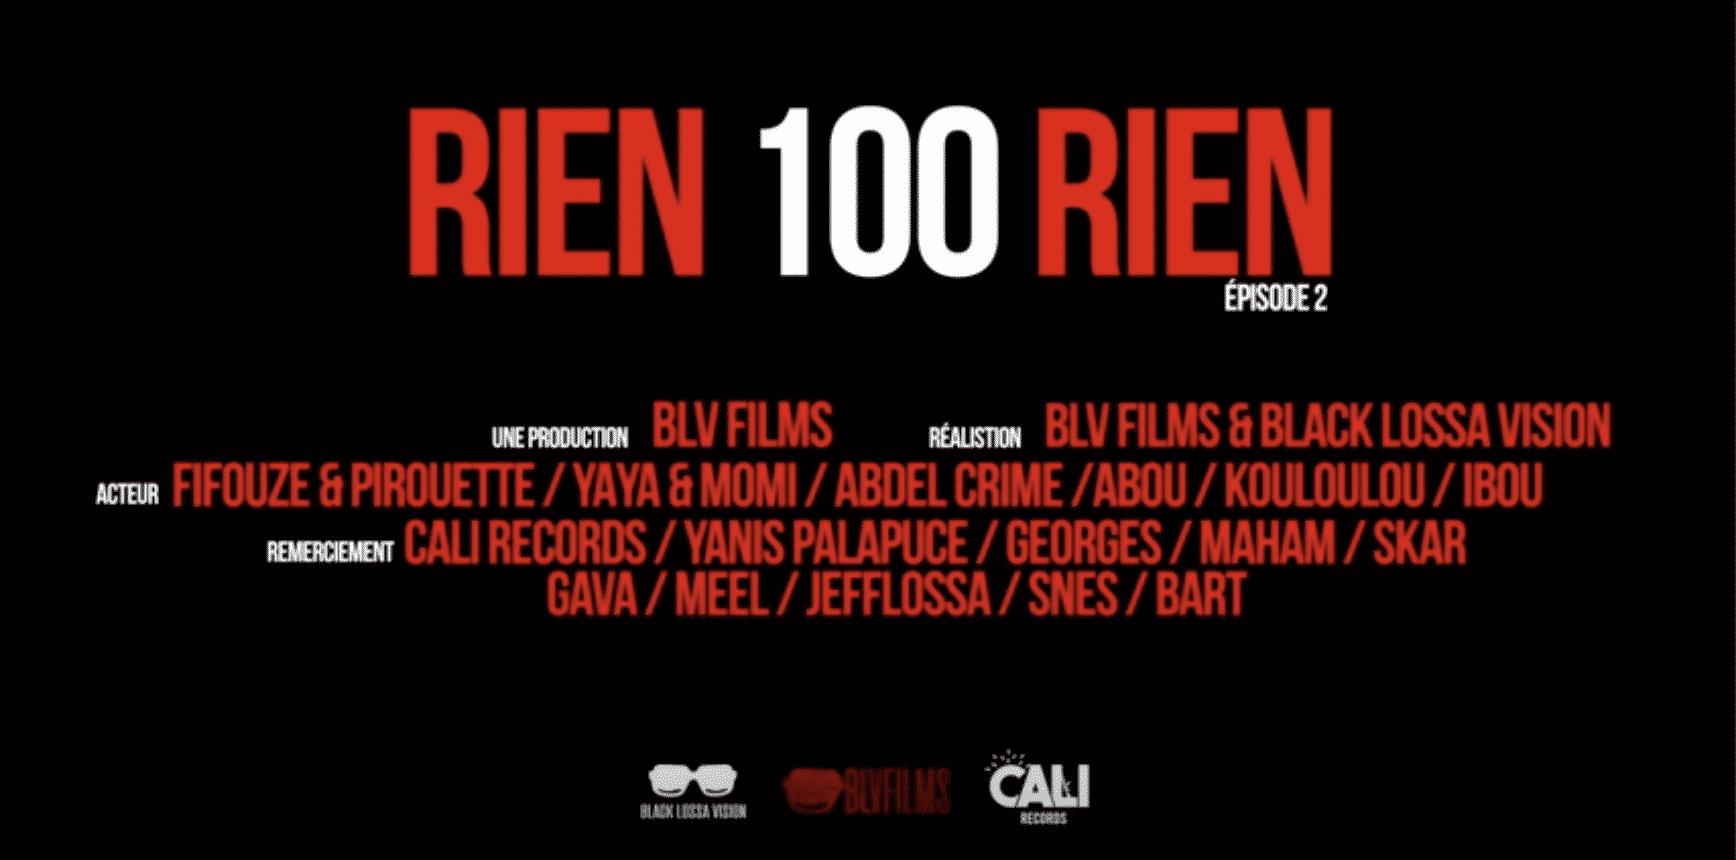 RIEN 100 RIEN - Episode 2 VF 72